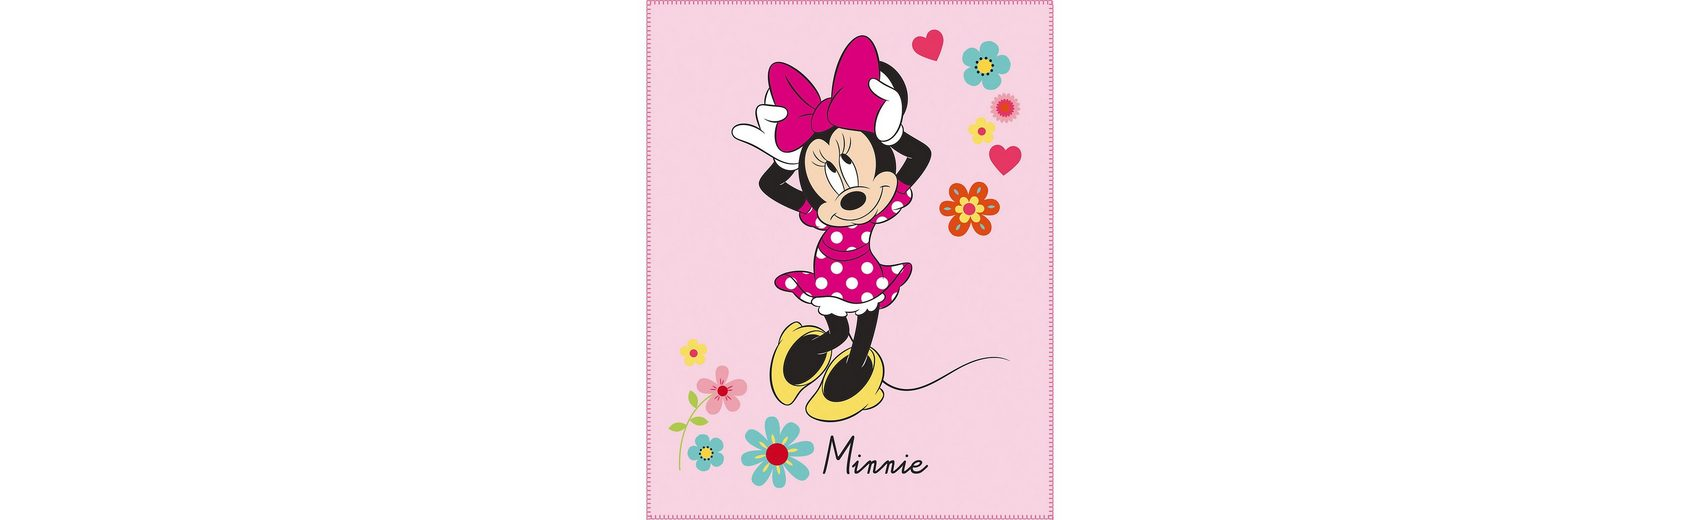 CTI Kuscheldecke Minnie Mouse, Liberty, 110 x 140 cm